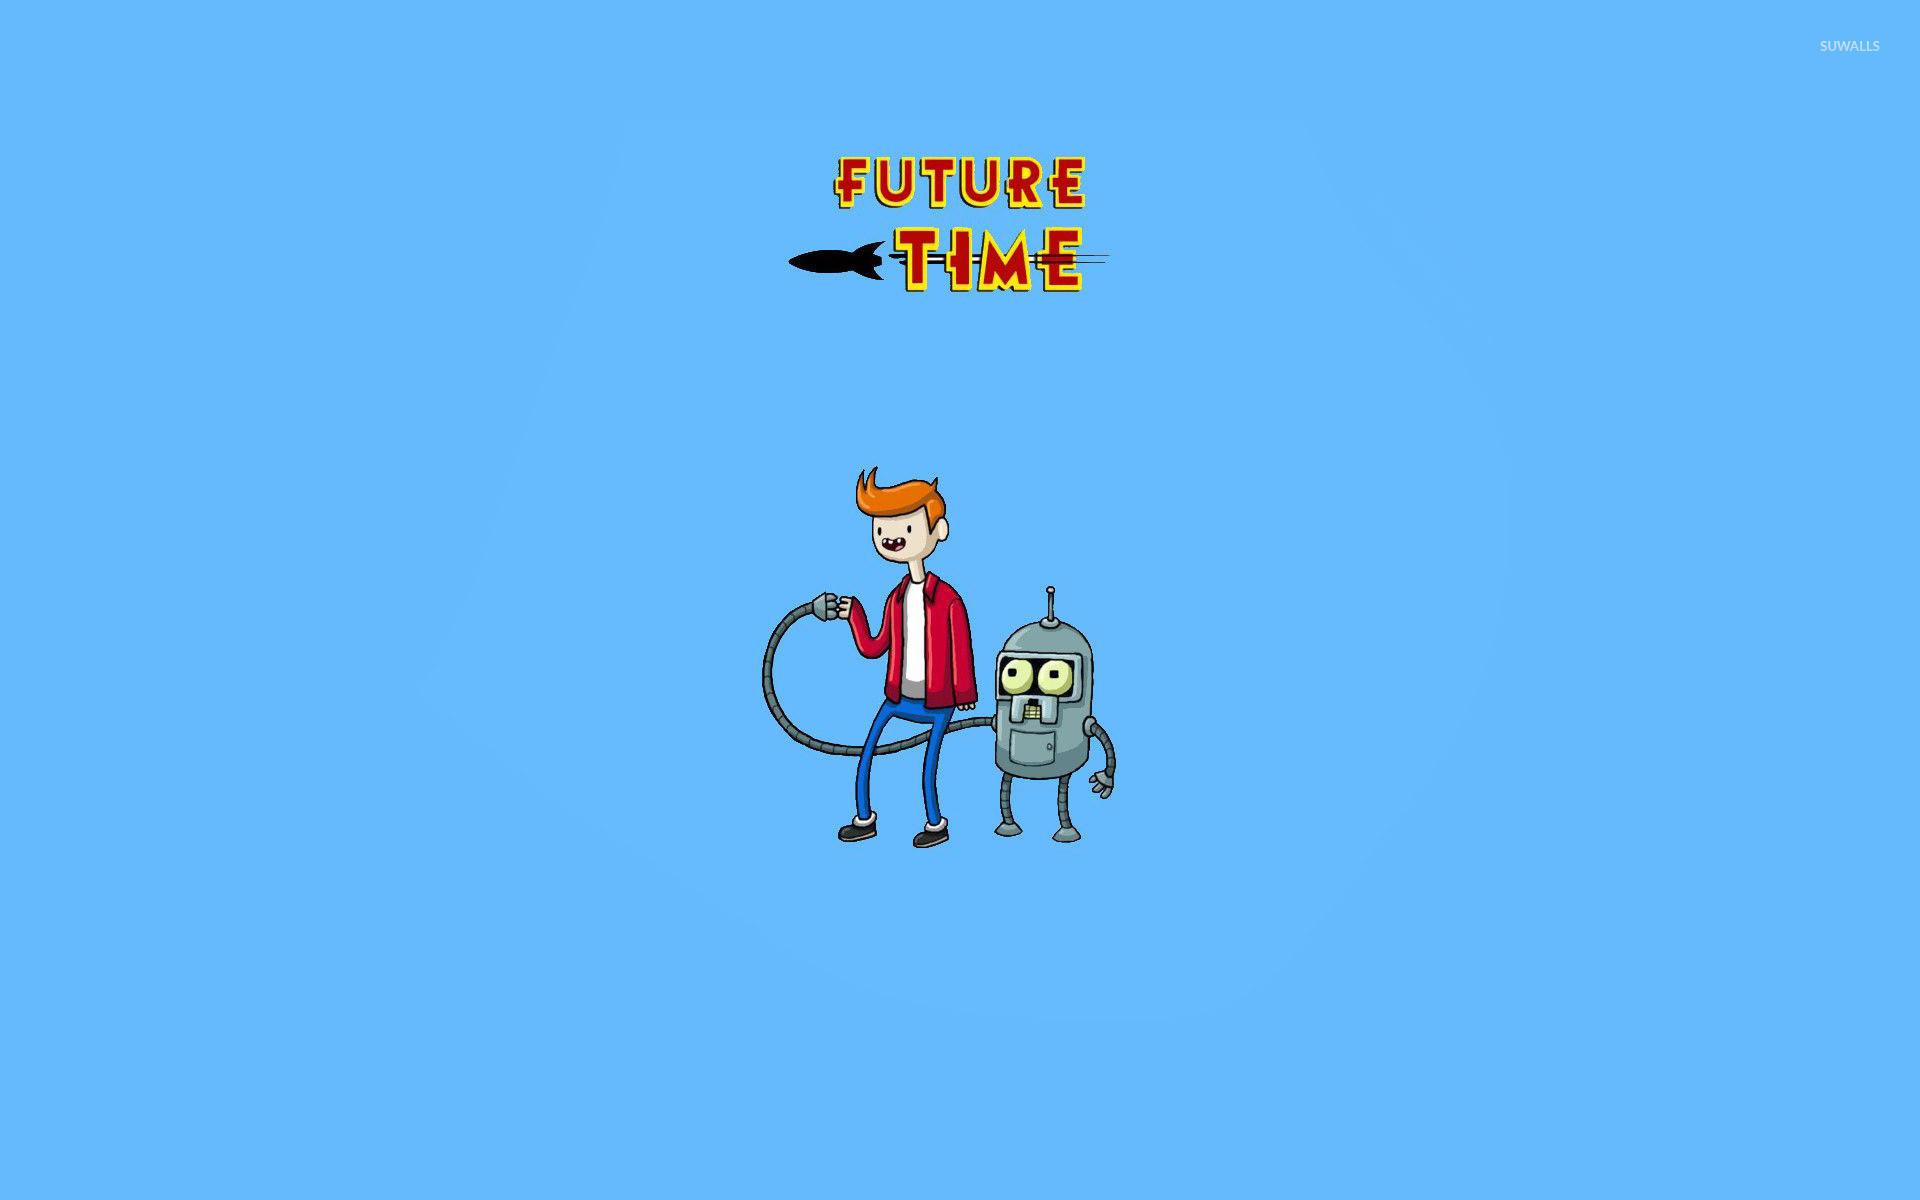 Res: 1920x1200, Future Time wallpaper